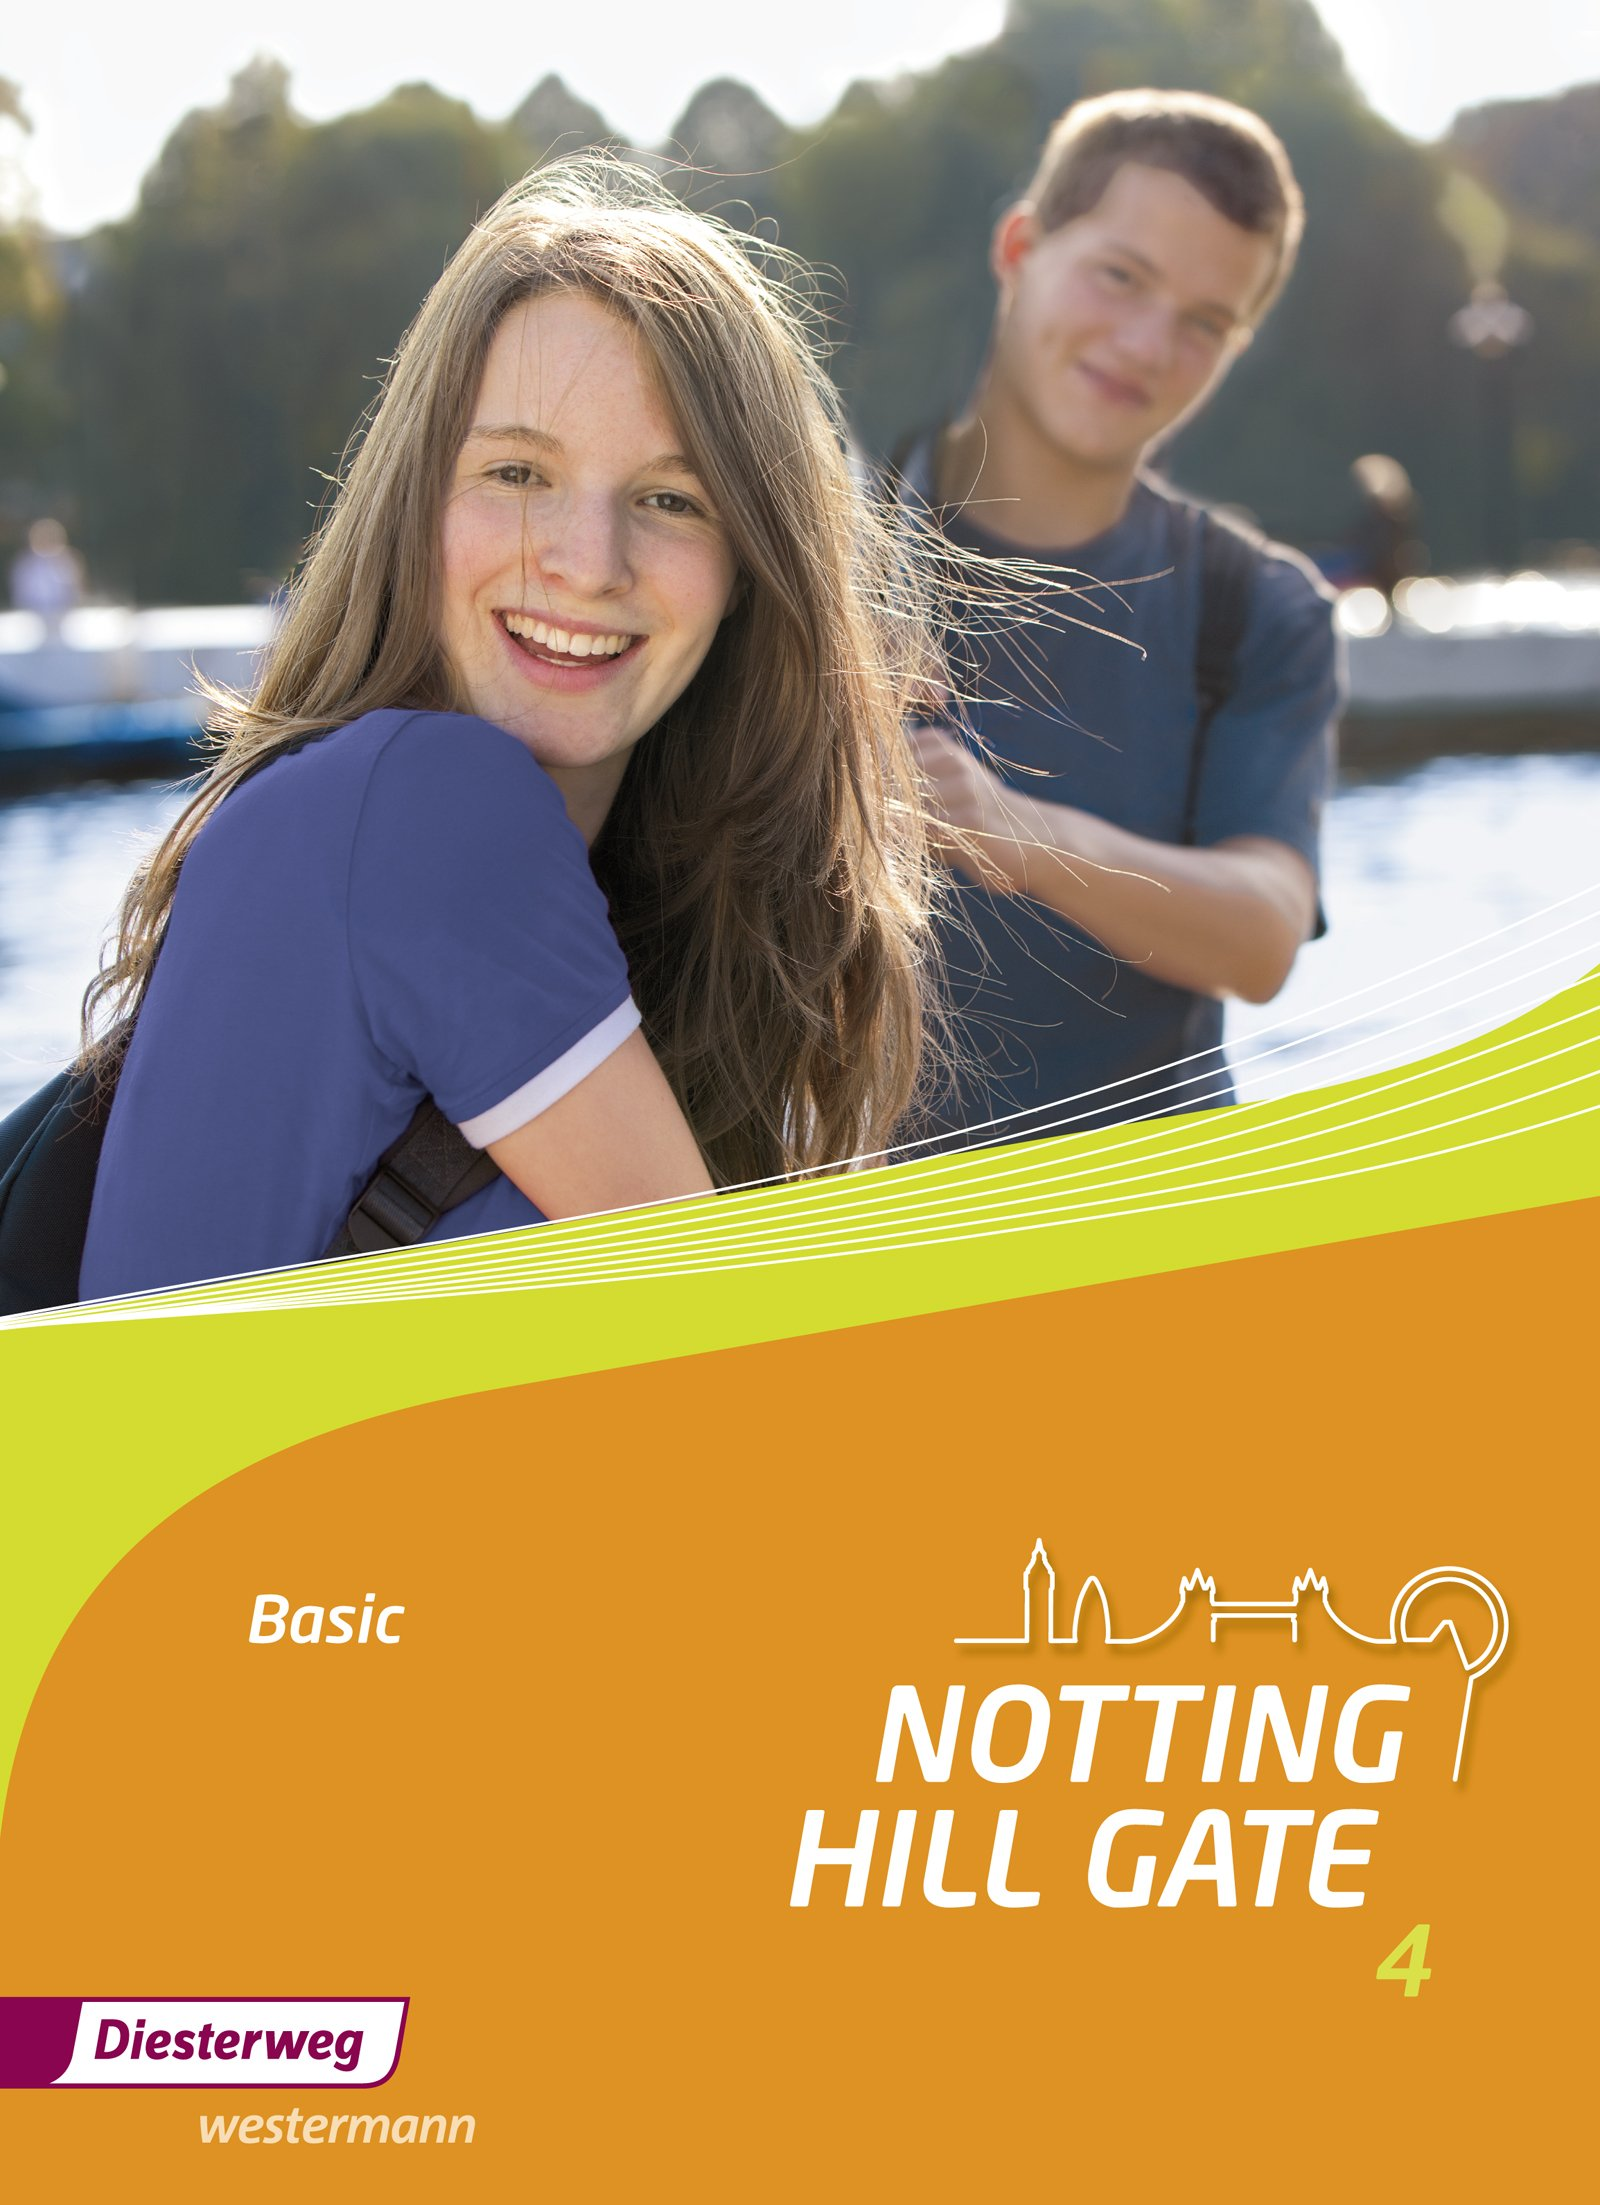 Textbook Basic Ausgabe 2014, Notting Hill Gate 3